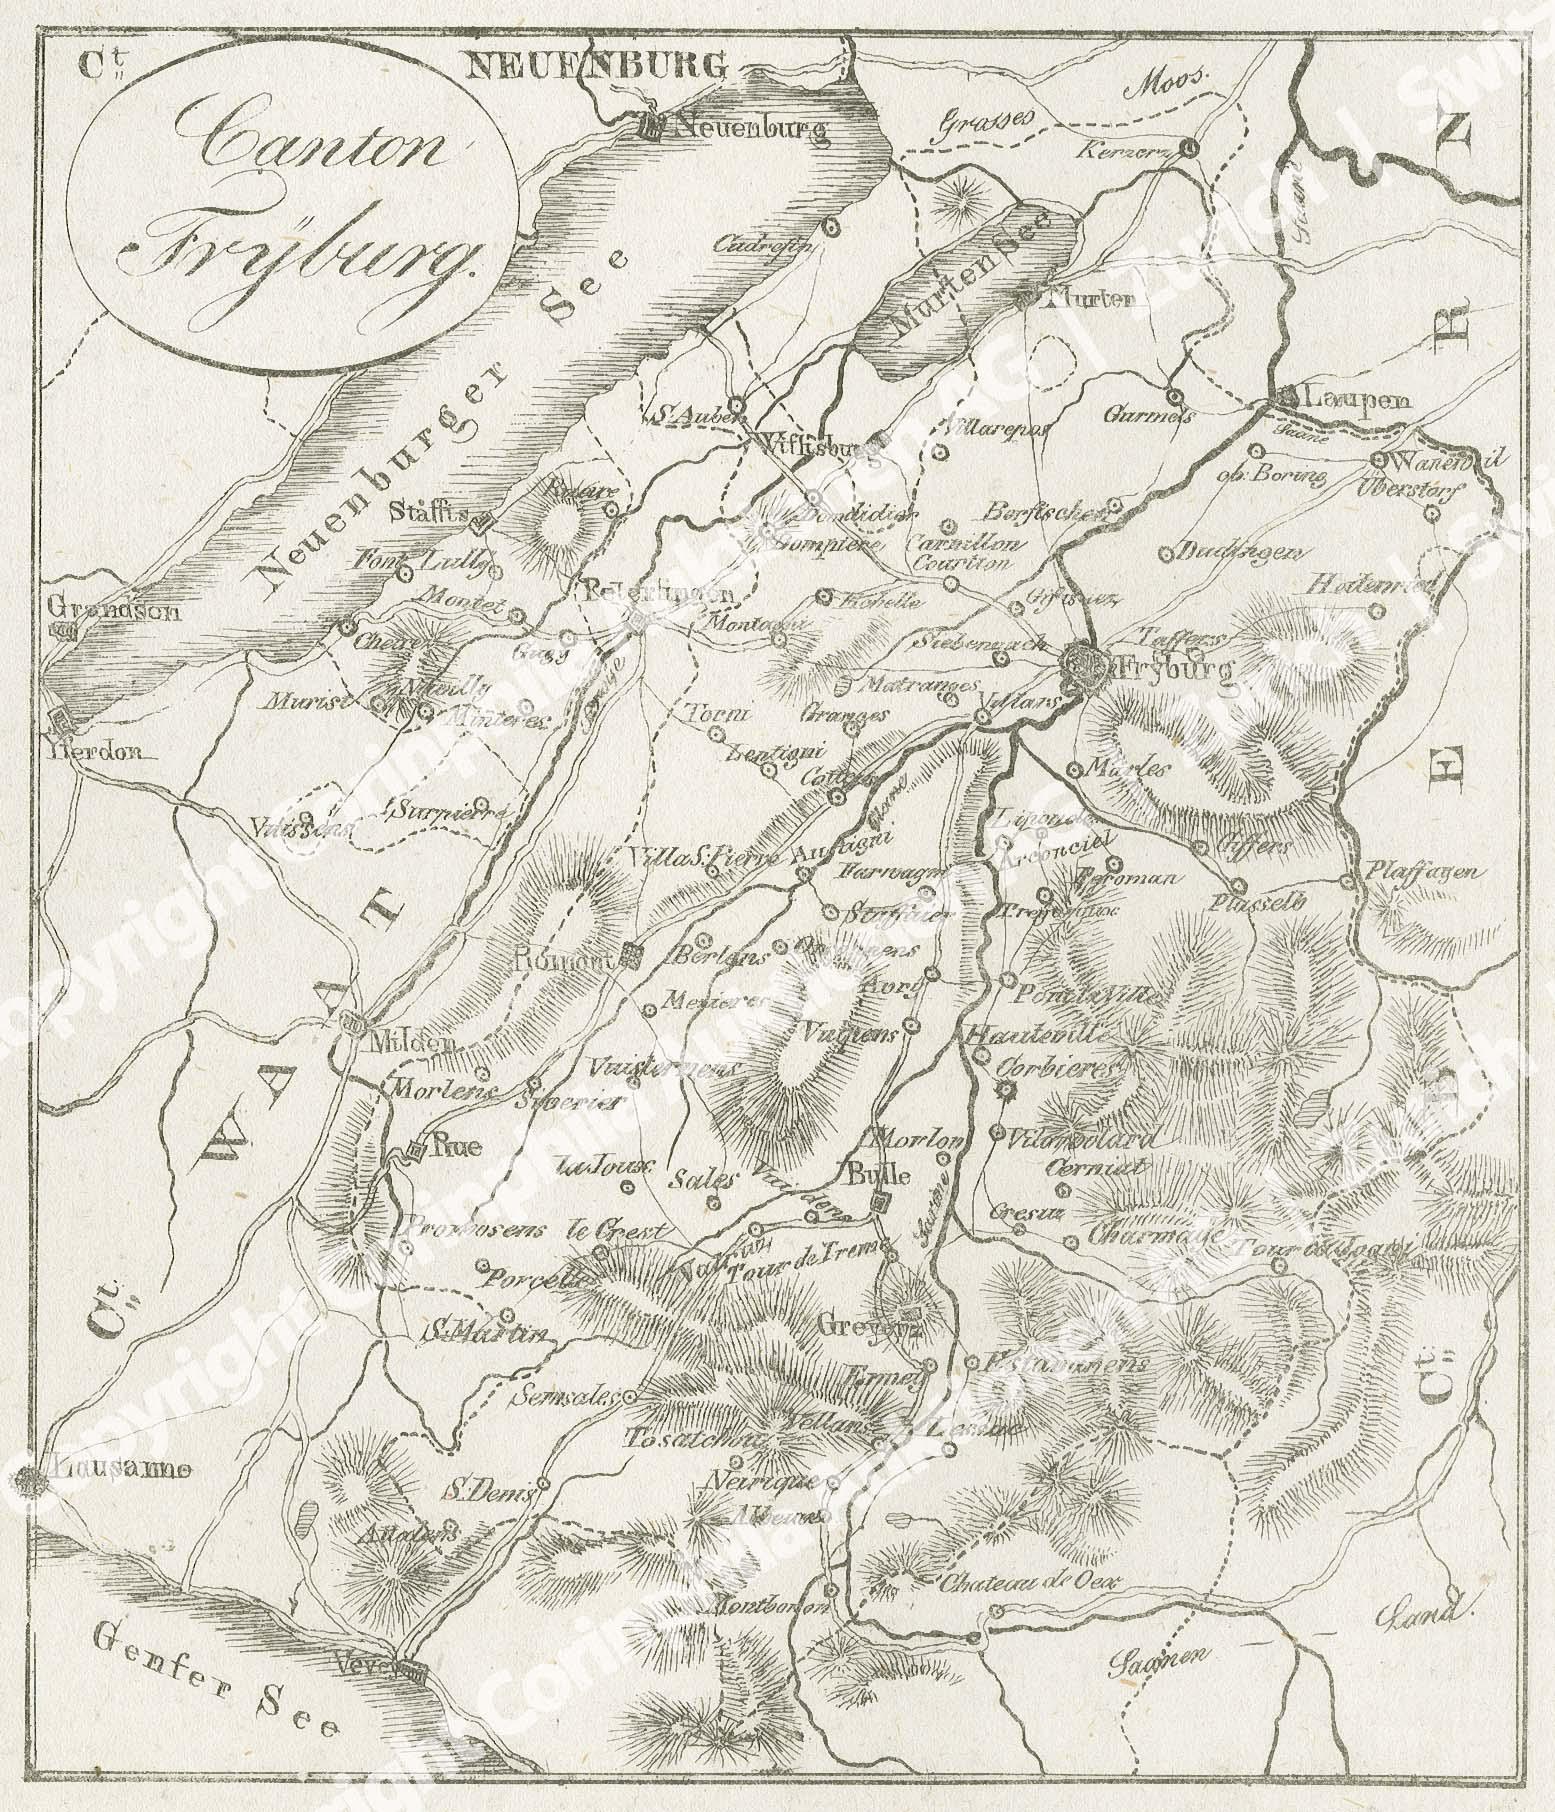 Kanton Fribourg